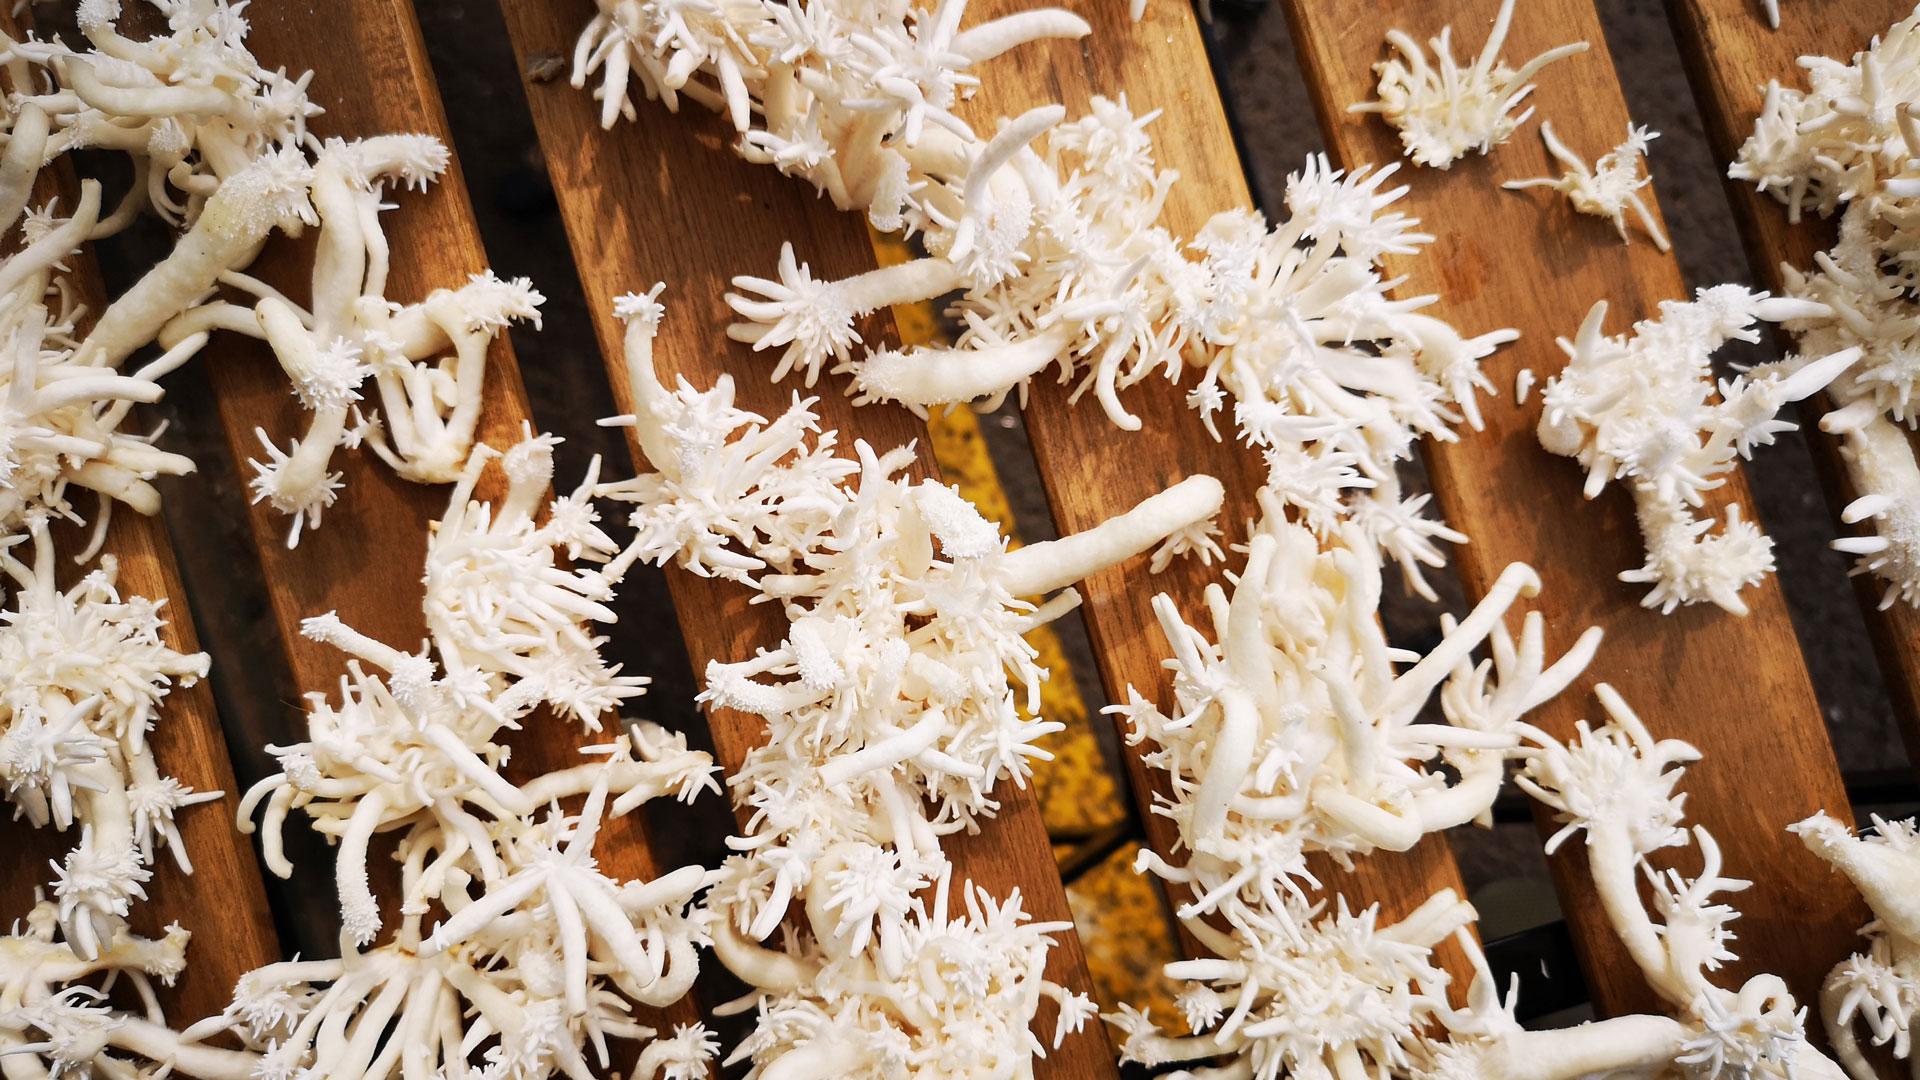 Mycelium fungi growths